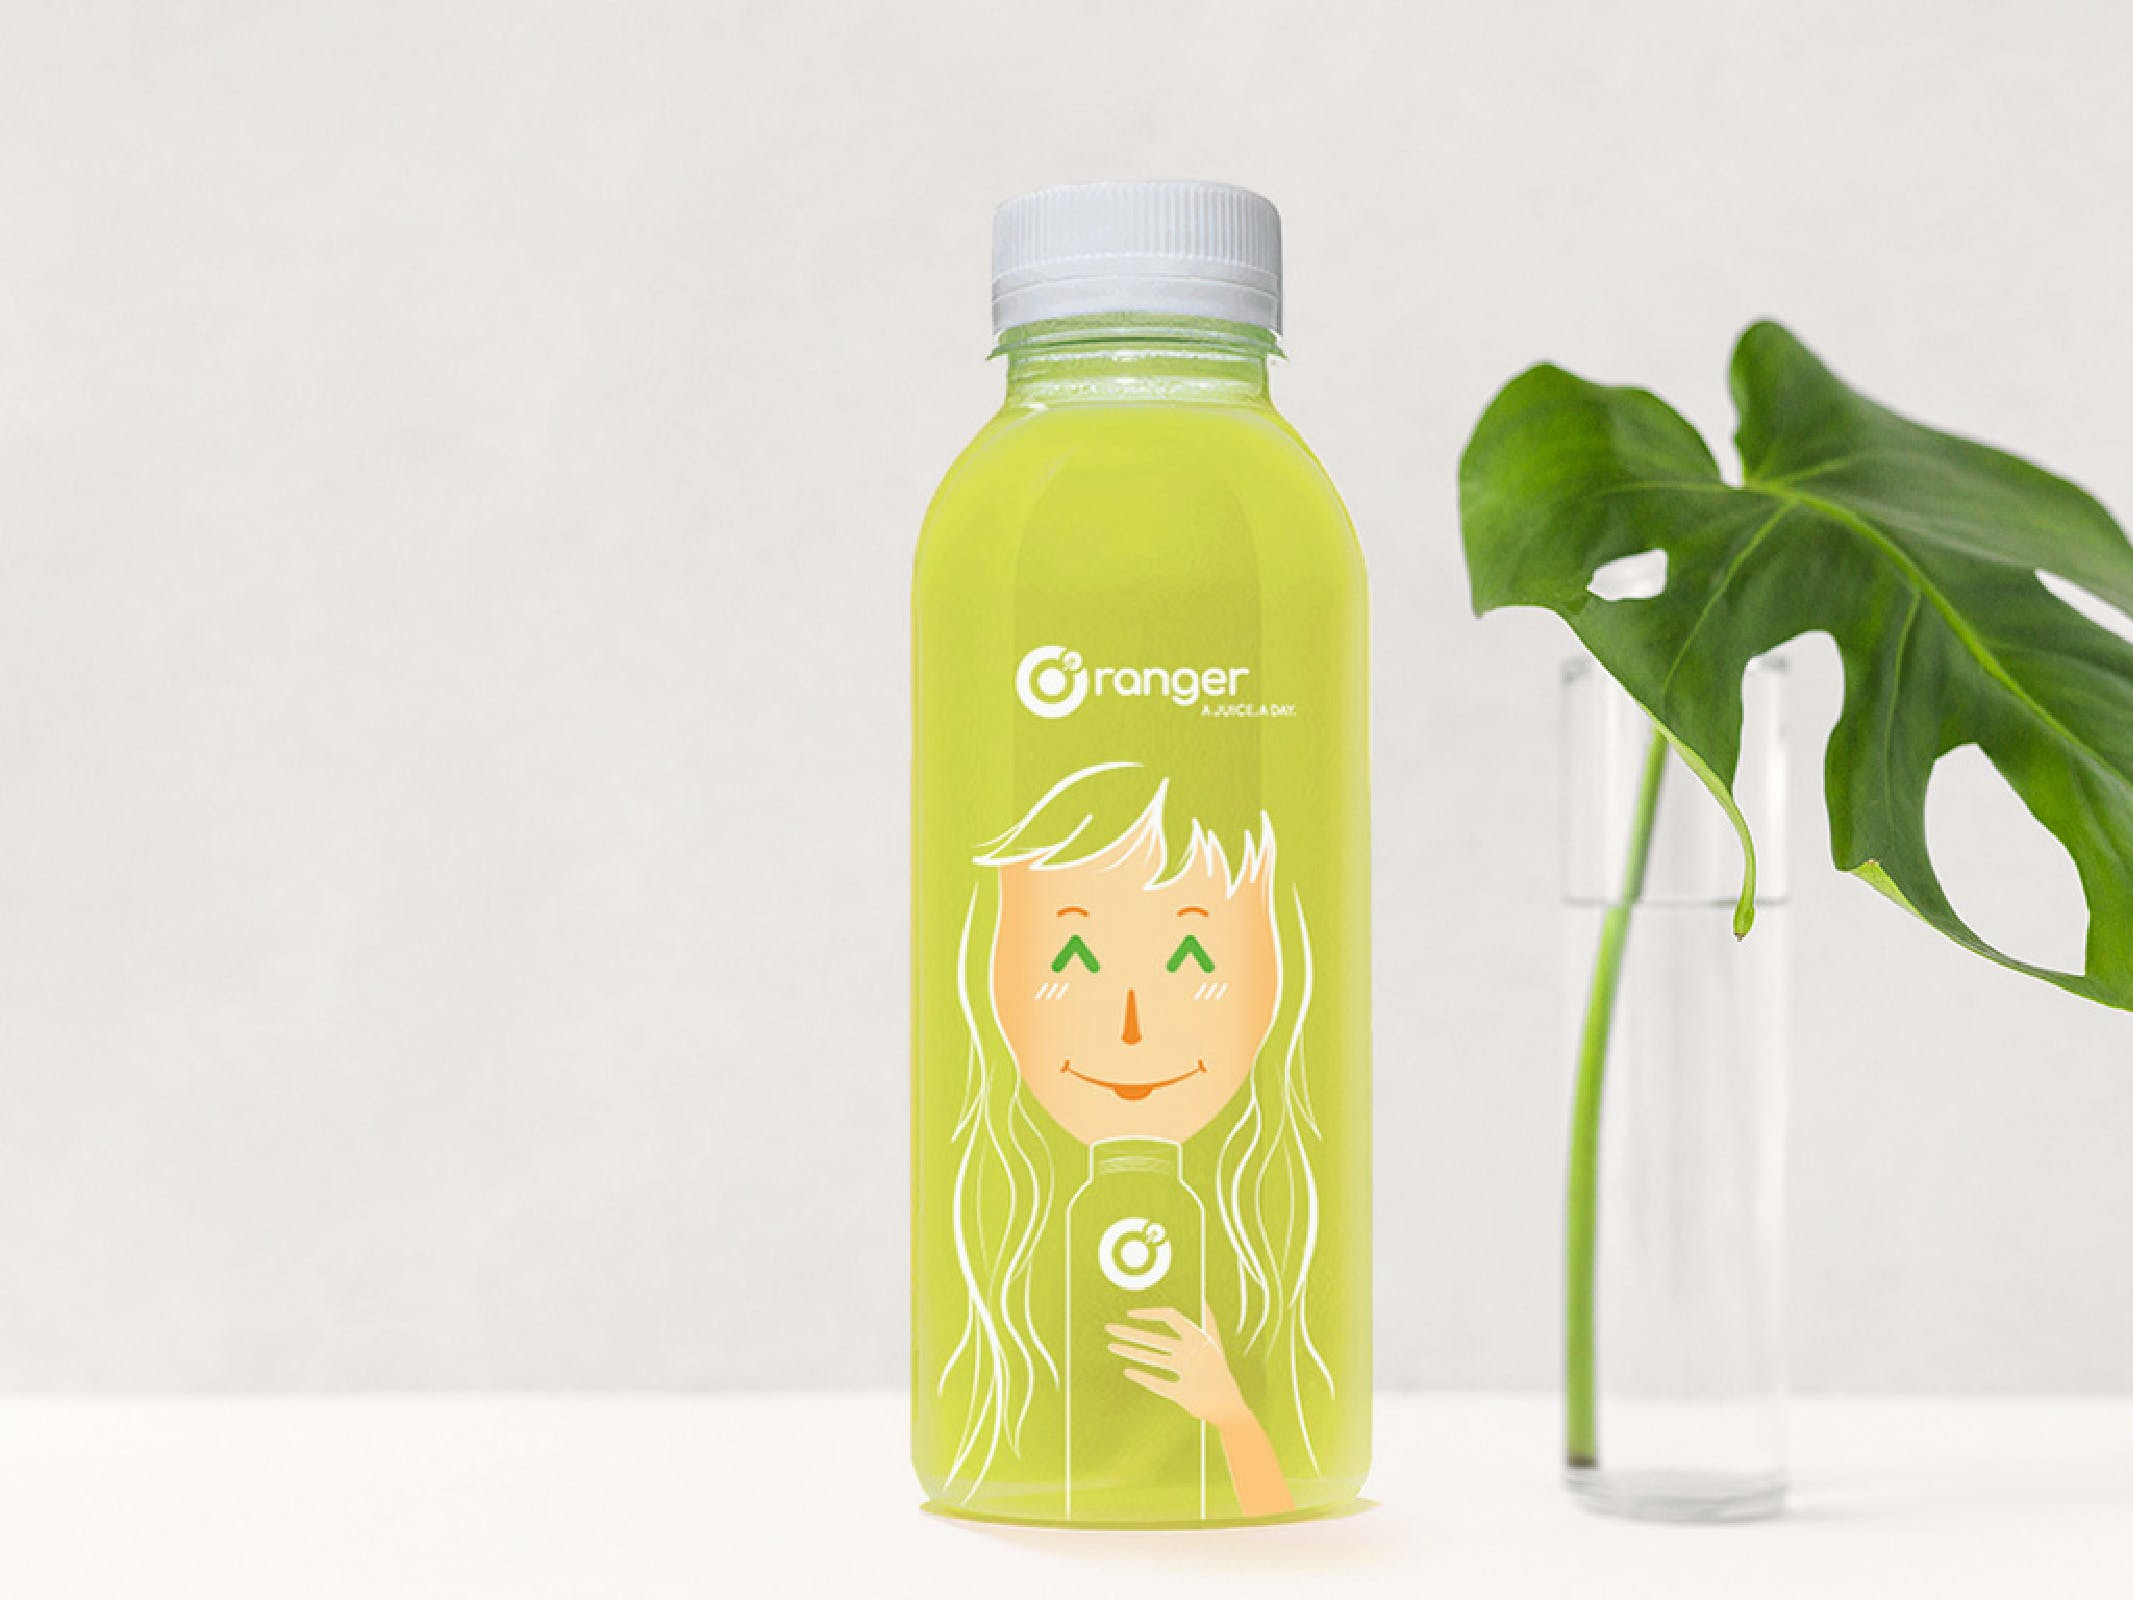 Oranger juice: Refresh